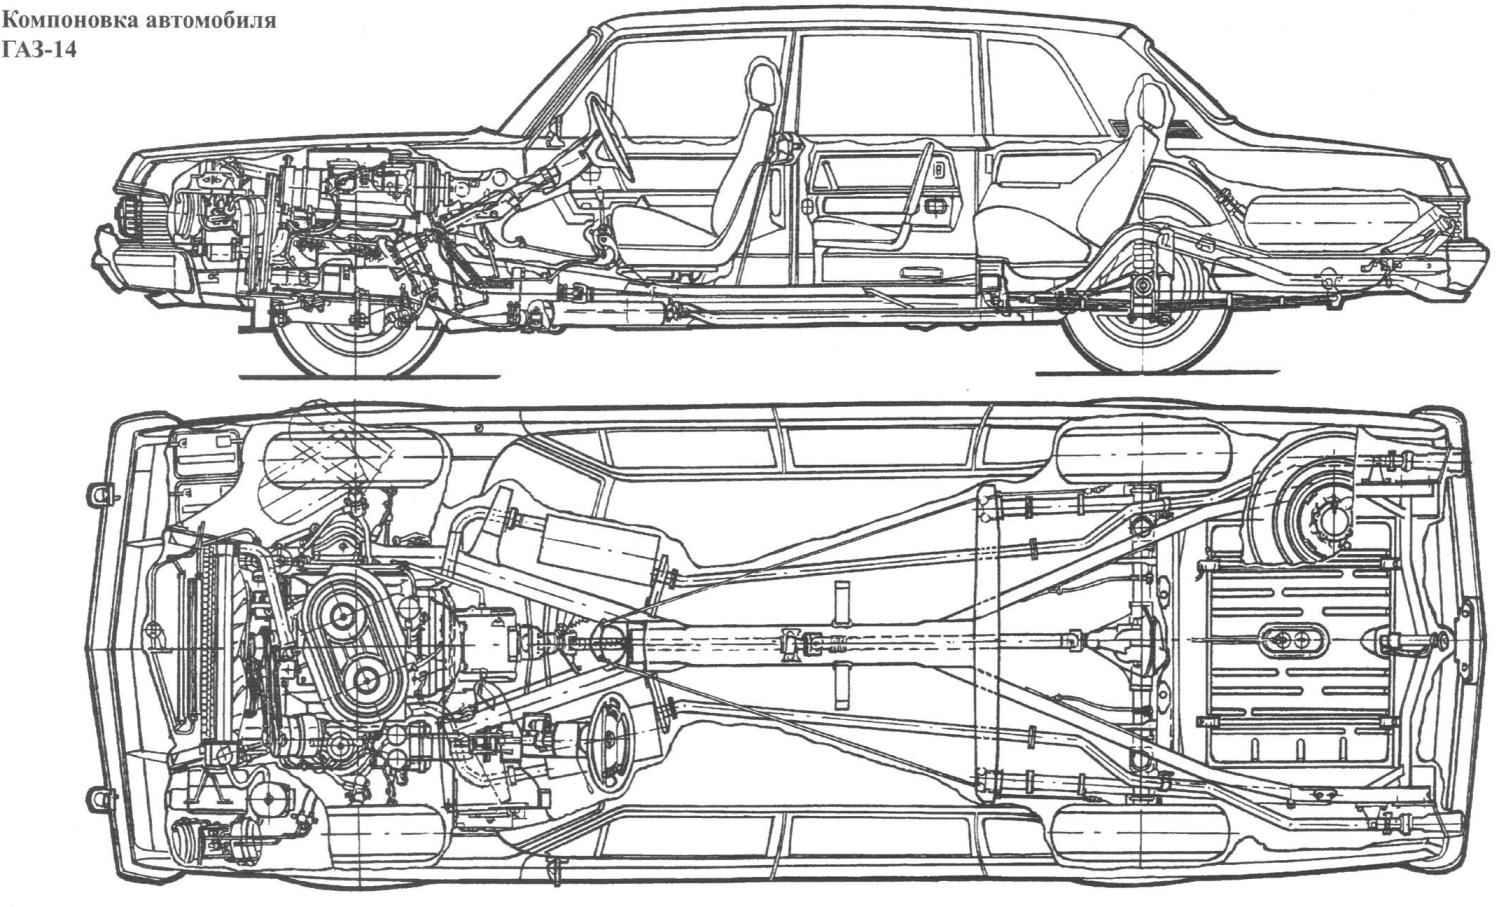 Компоновка автомобиля ГАЗ-14